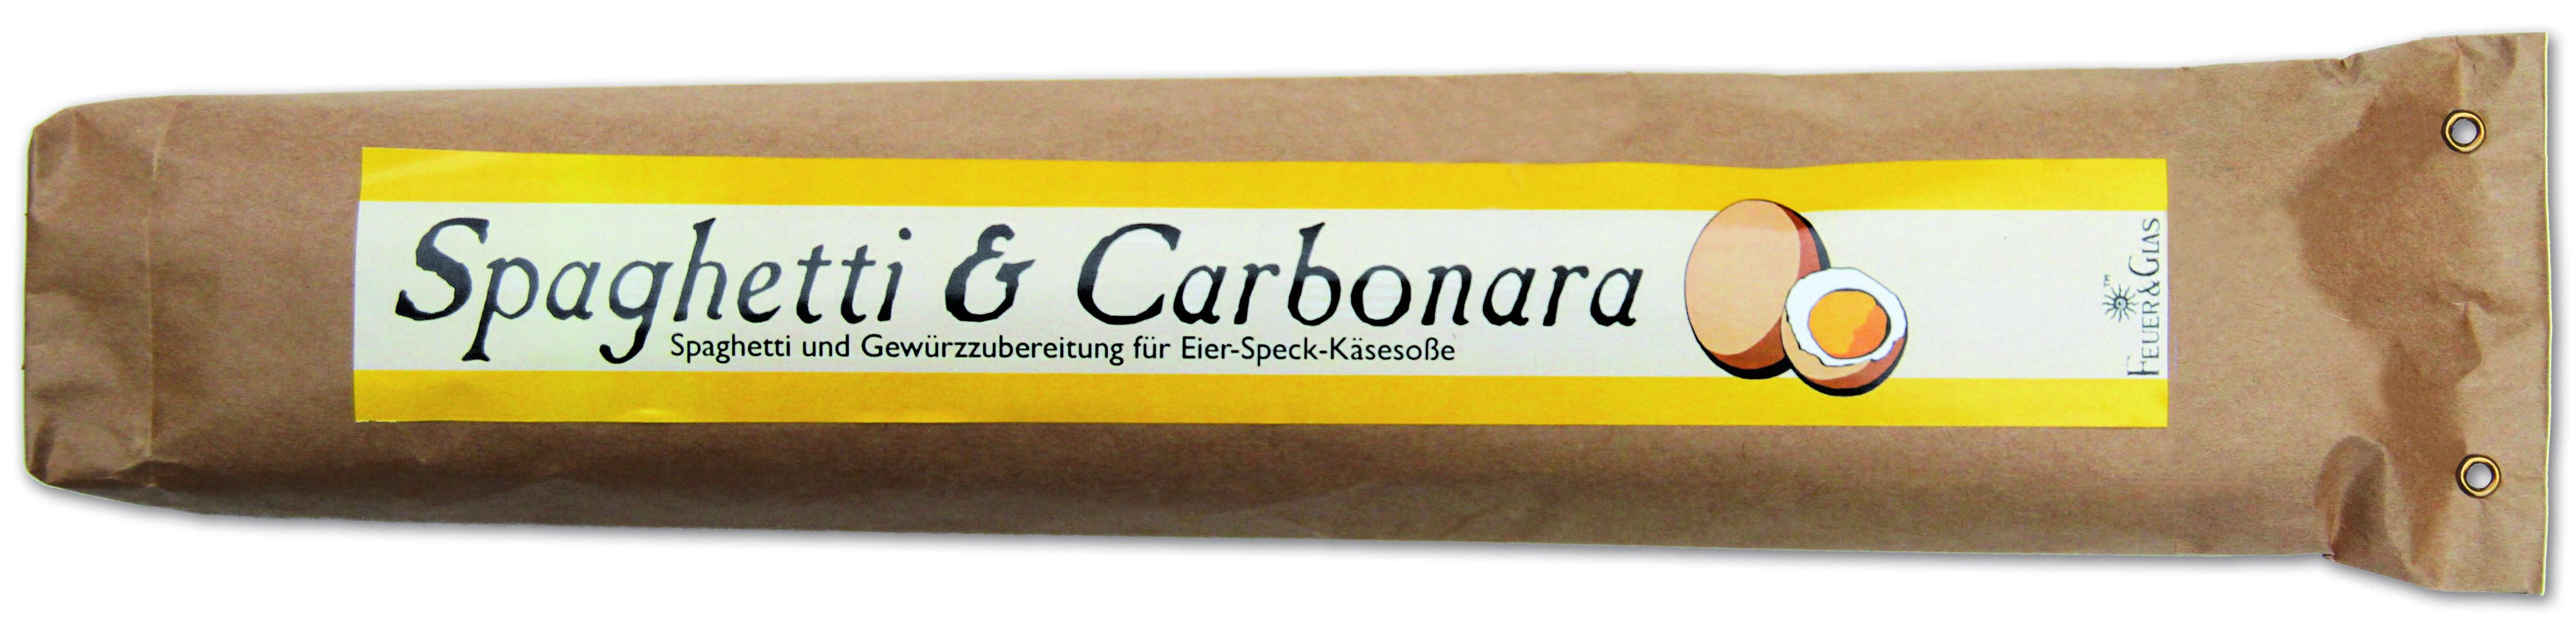 Spaghetti & Carbonara